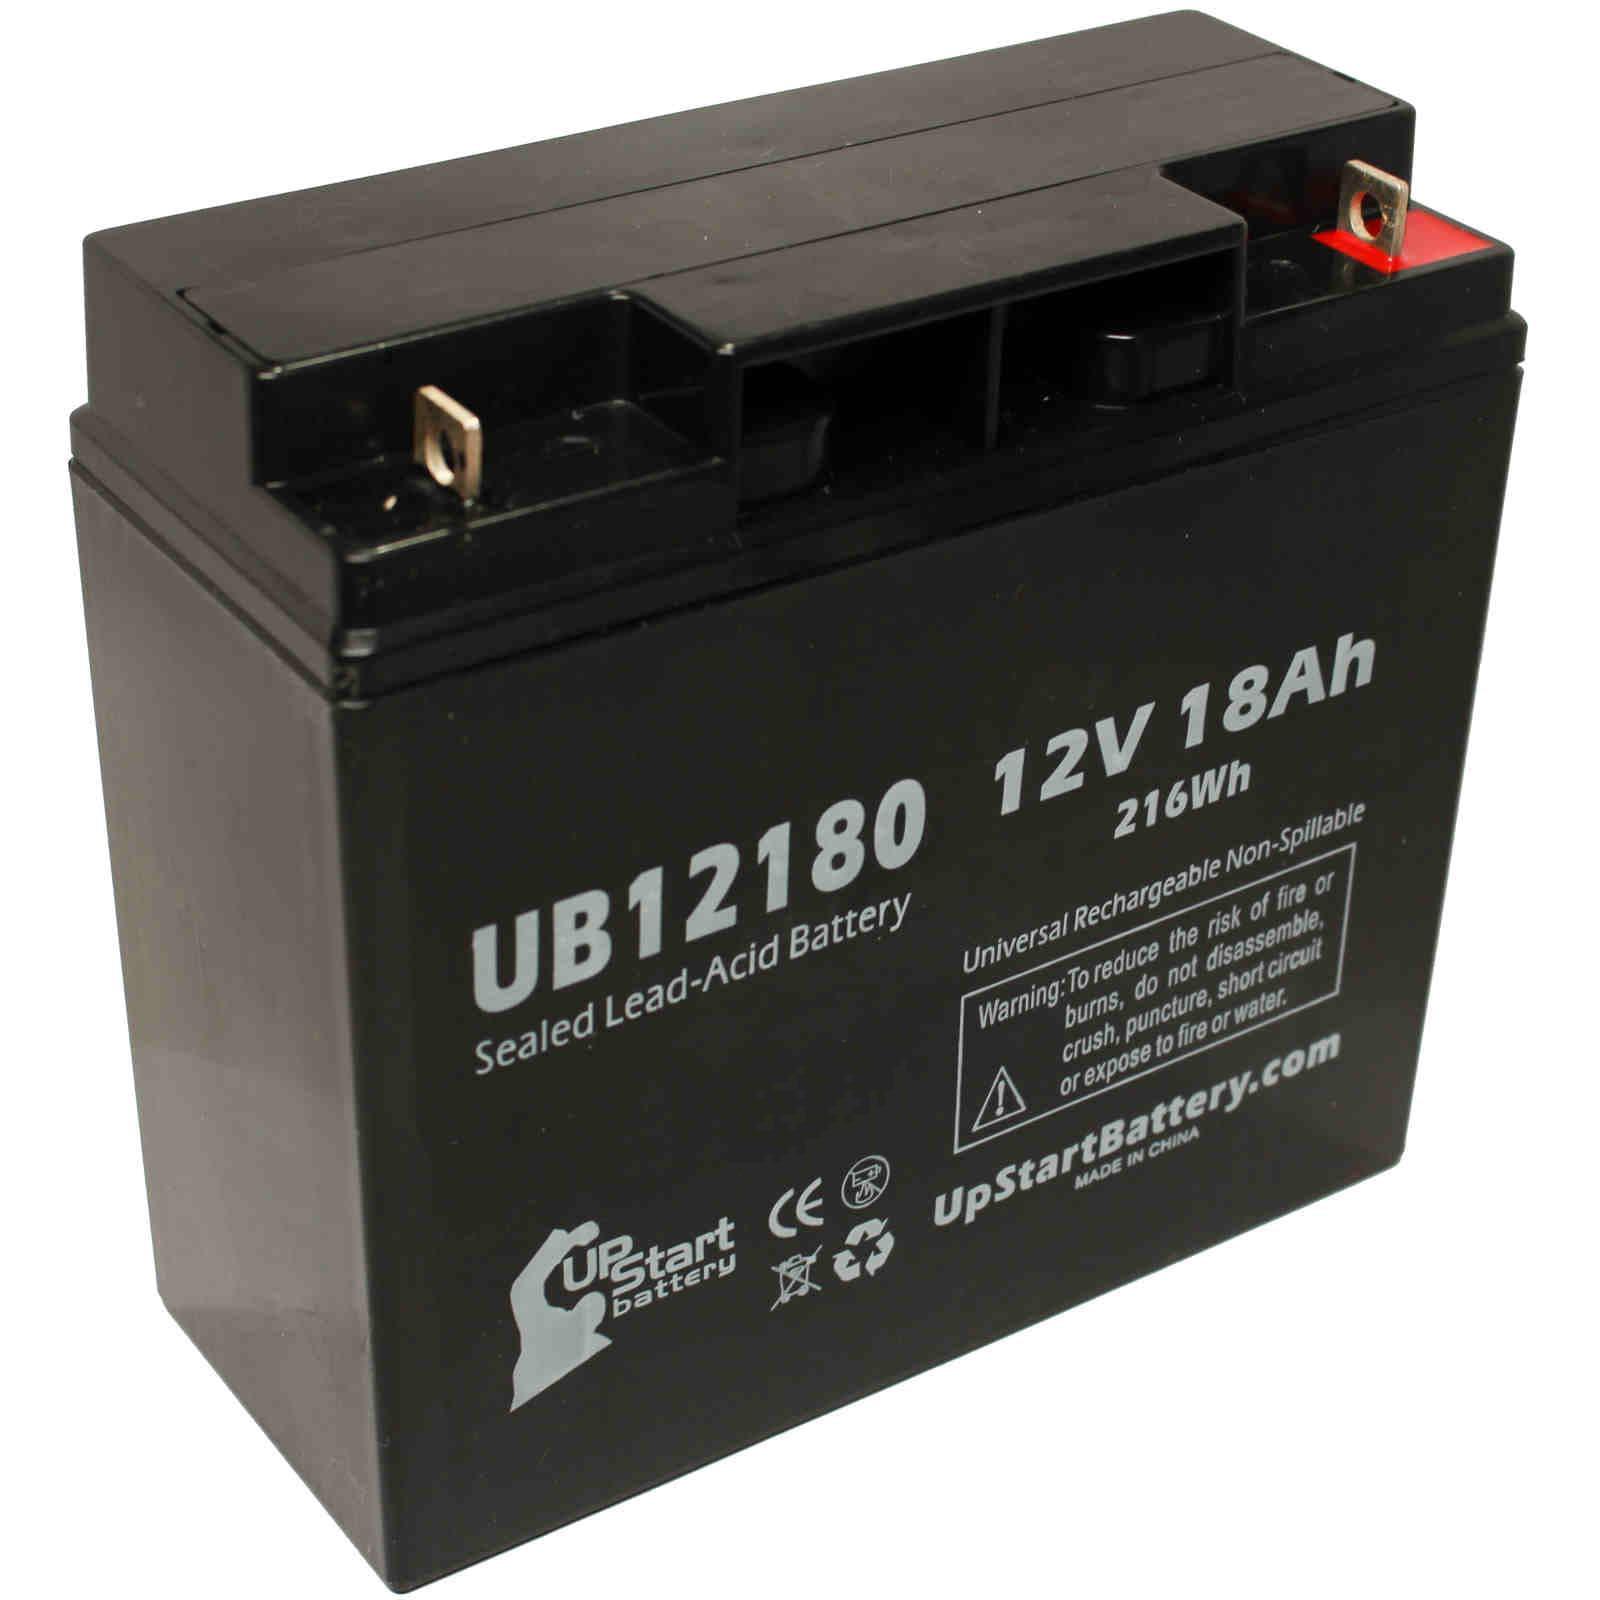 2x Pack - PANASONIC LCRD1217P Battery Replacement -  UB12180 Universal Sealed Lead Acid Battery (12V, 18Ah, 18000mAh, T4 Terminal, AGM, SLA)